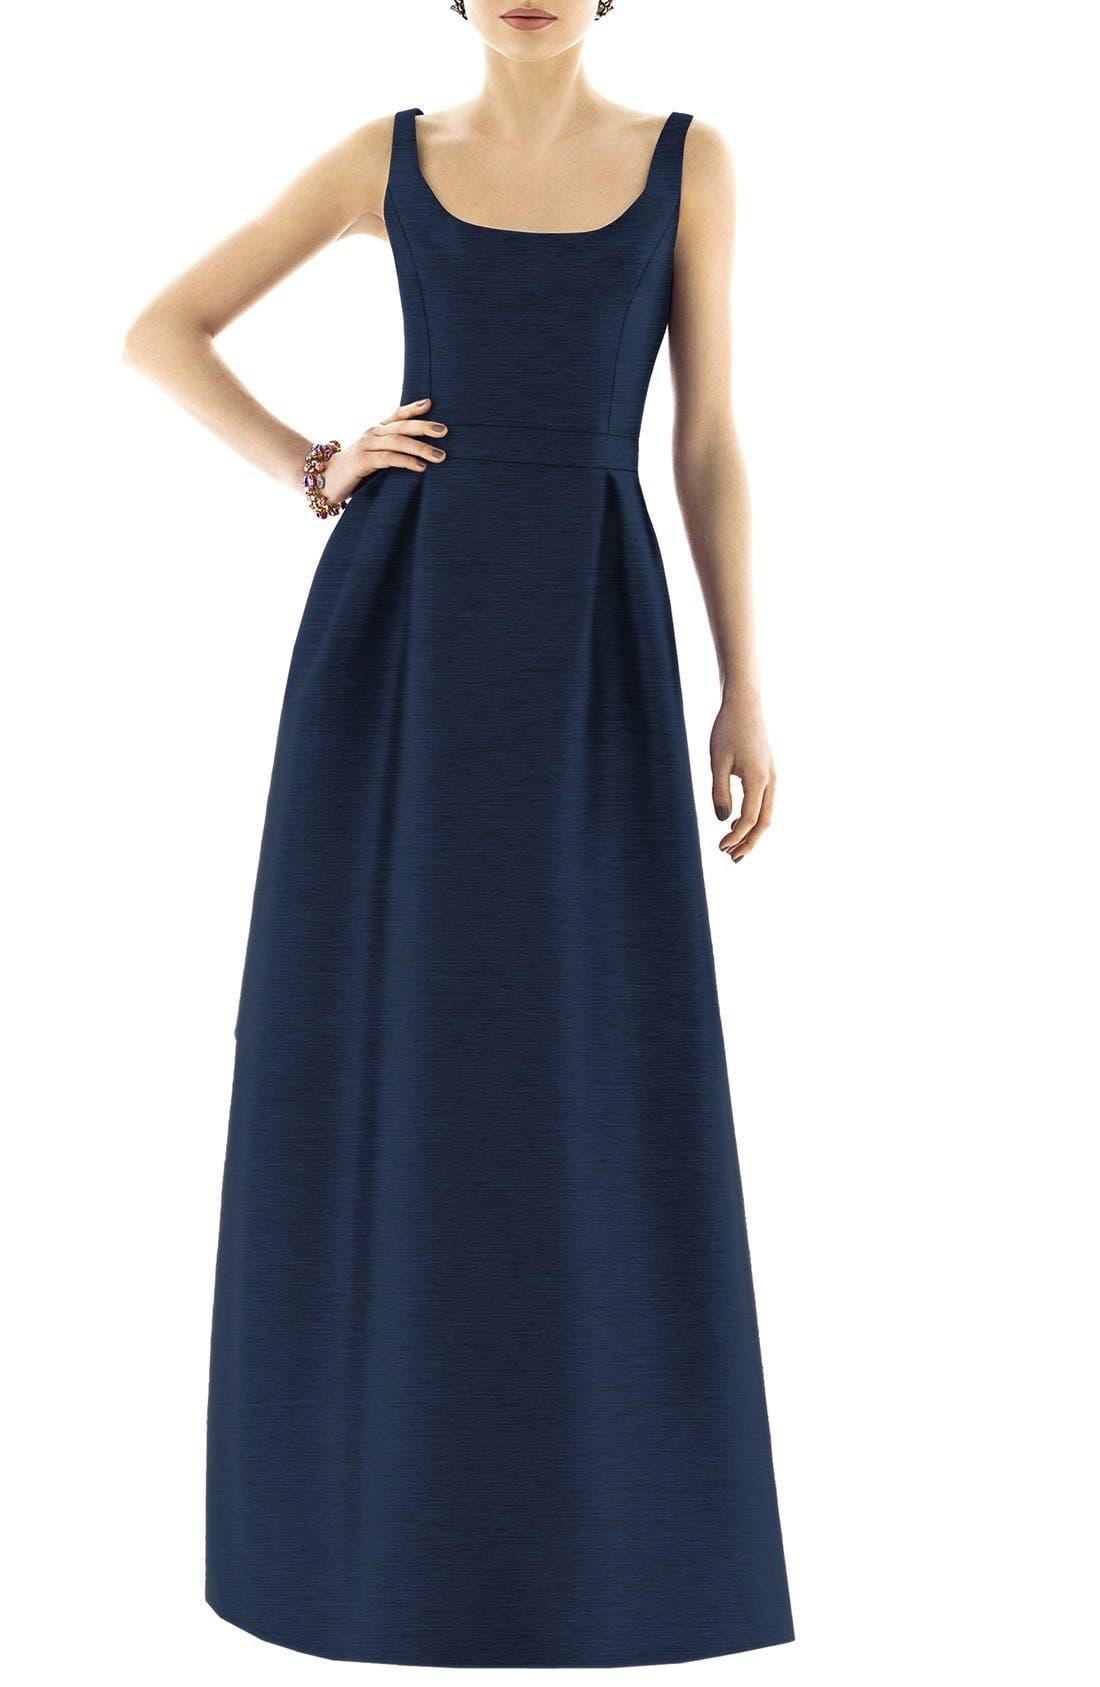 Scoop Neck Dupioni Full Length Dress,                             Alternate thumbnail 14, color,